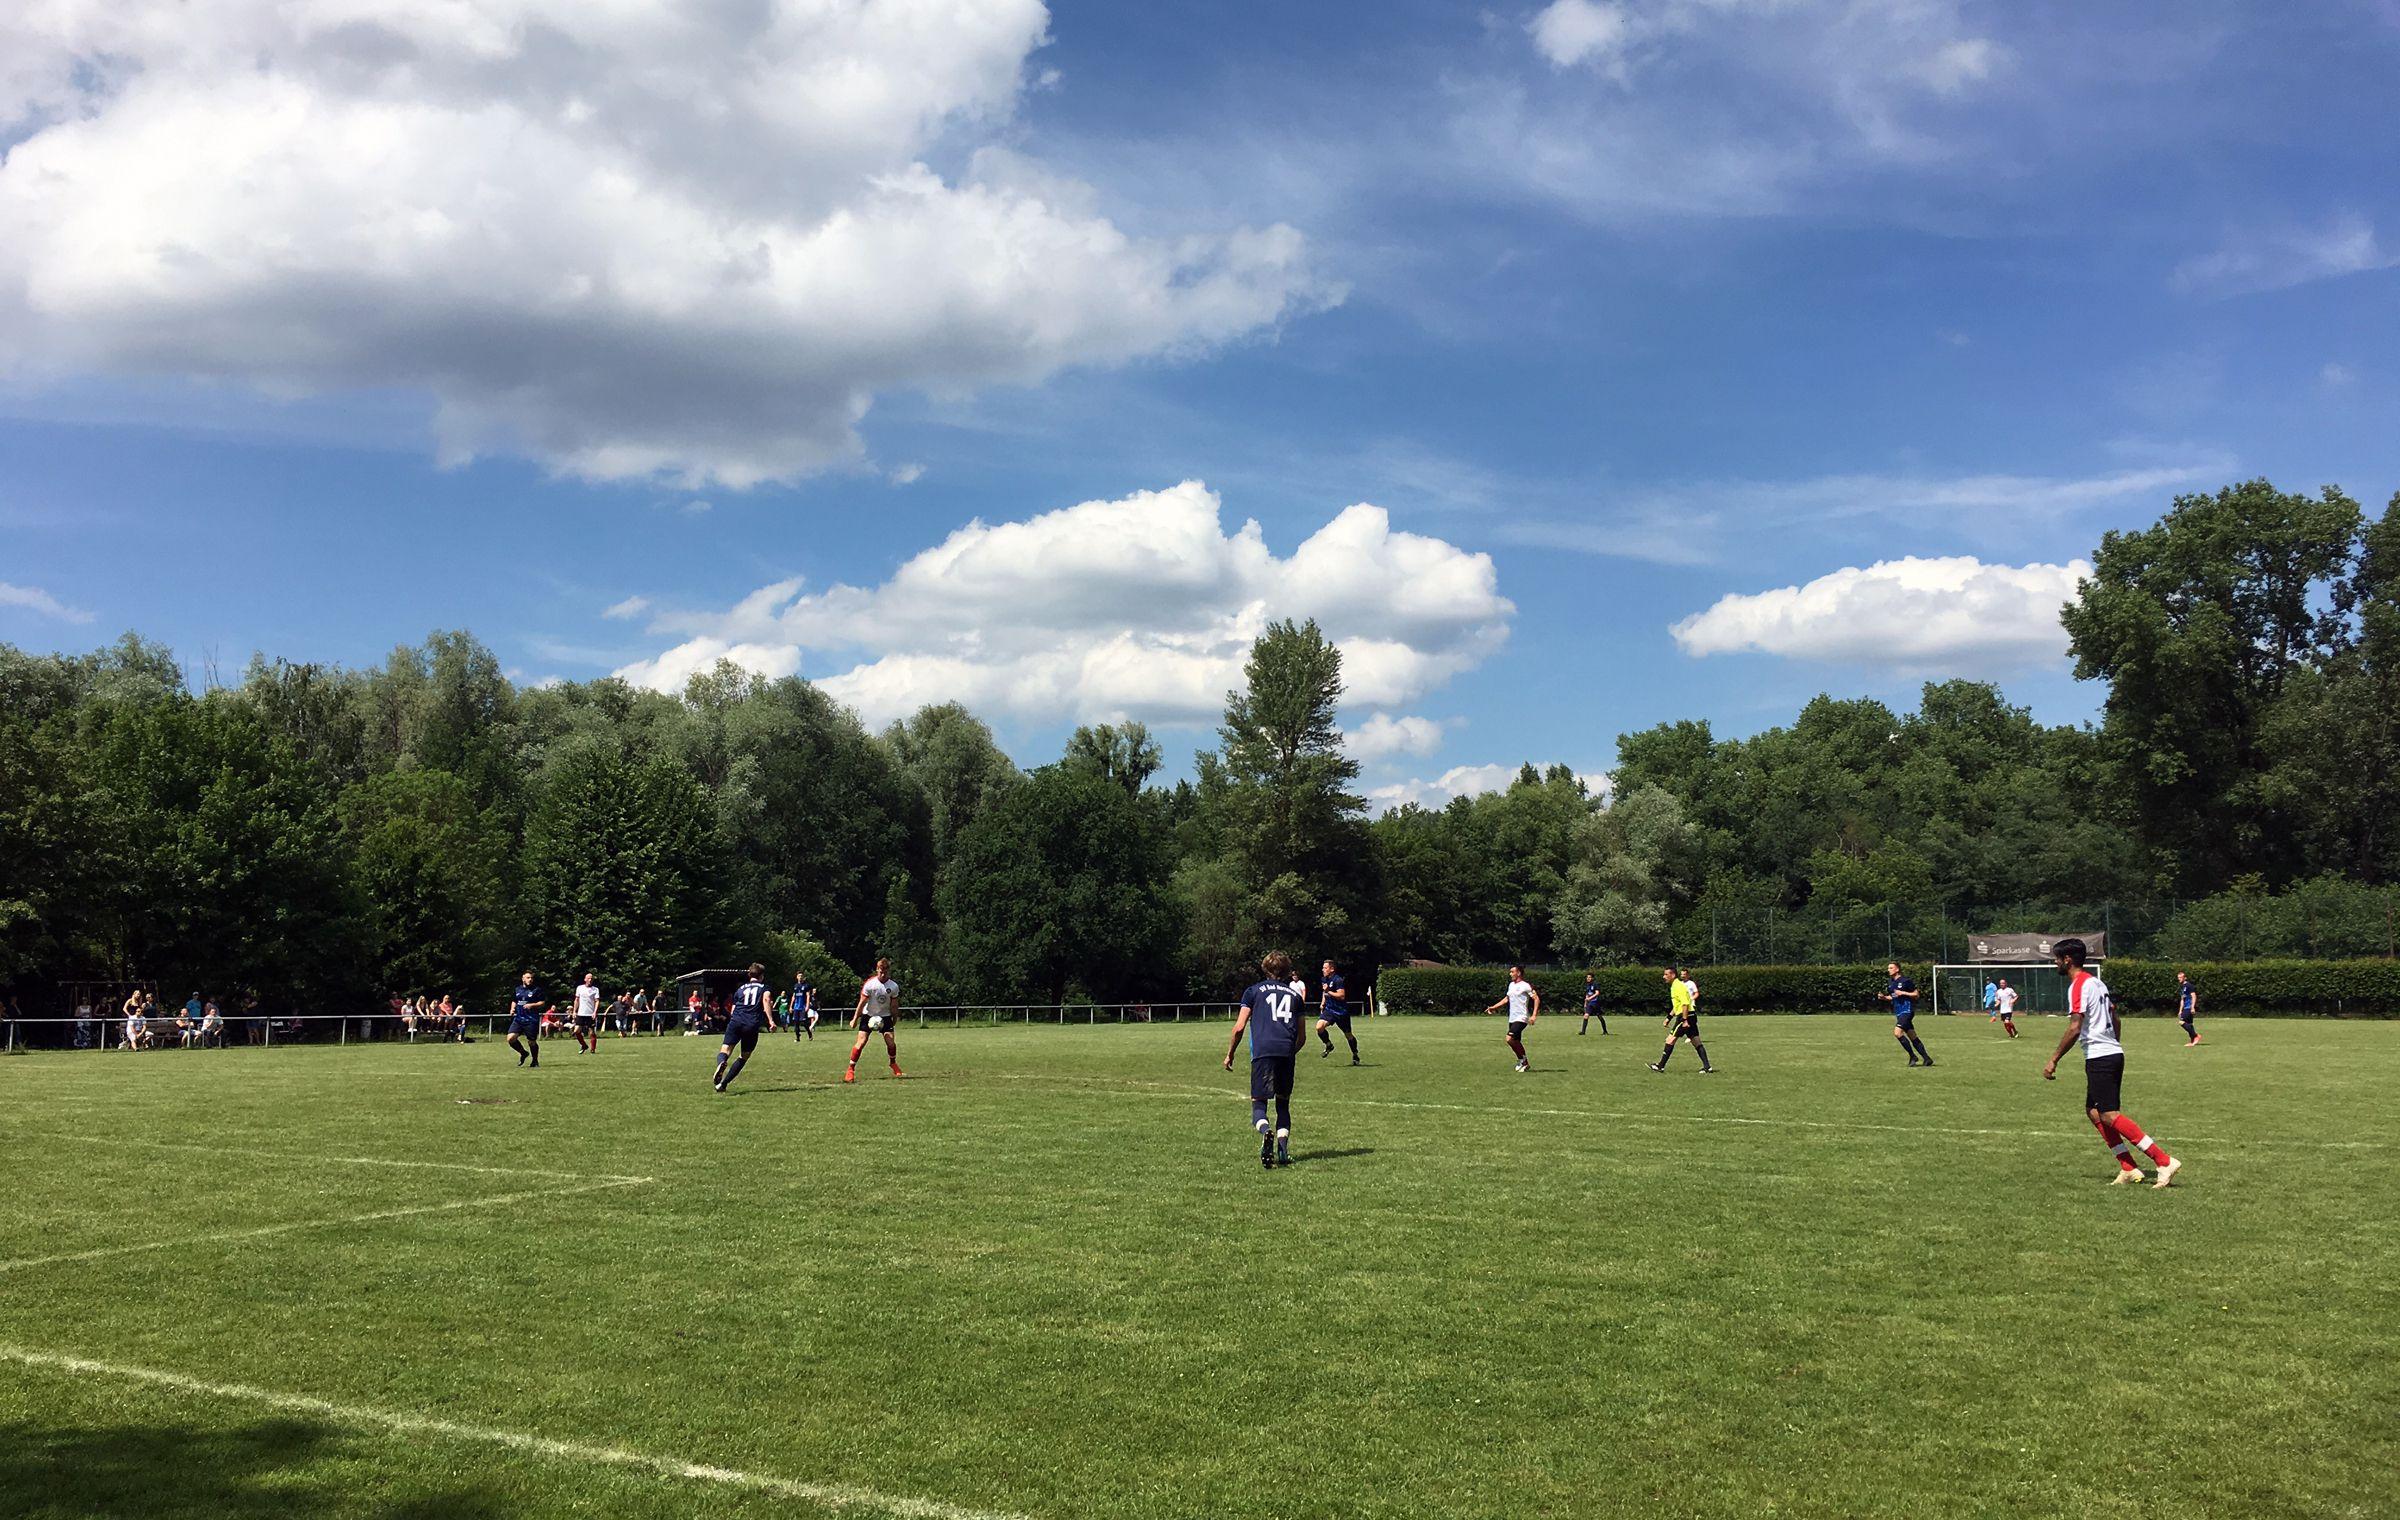 Karlsruher FV vs SG Herrenalb/Neusatz/Rotensol